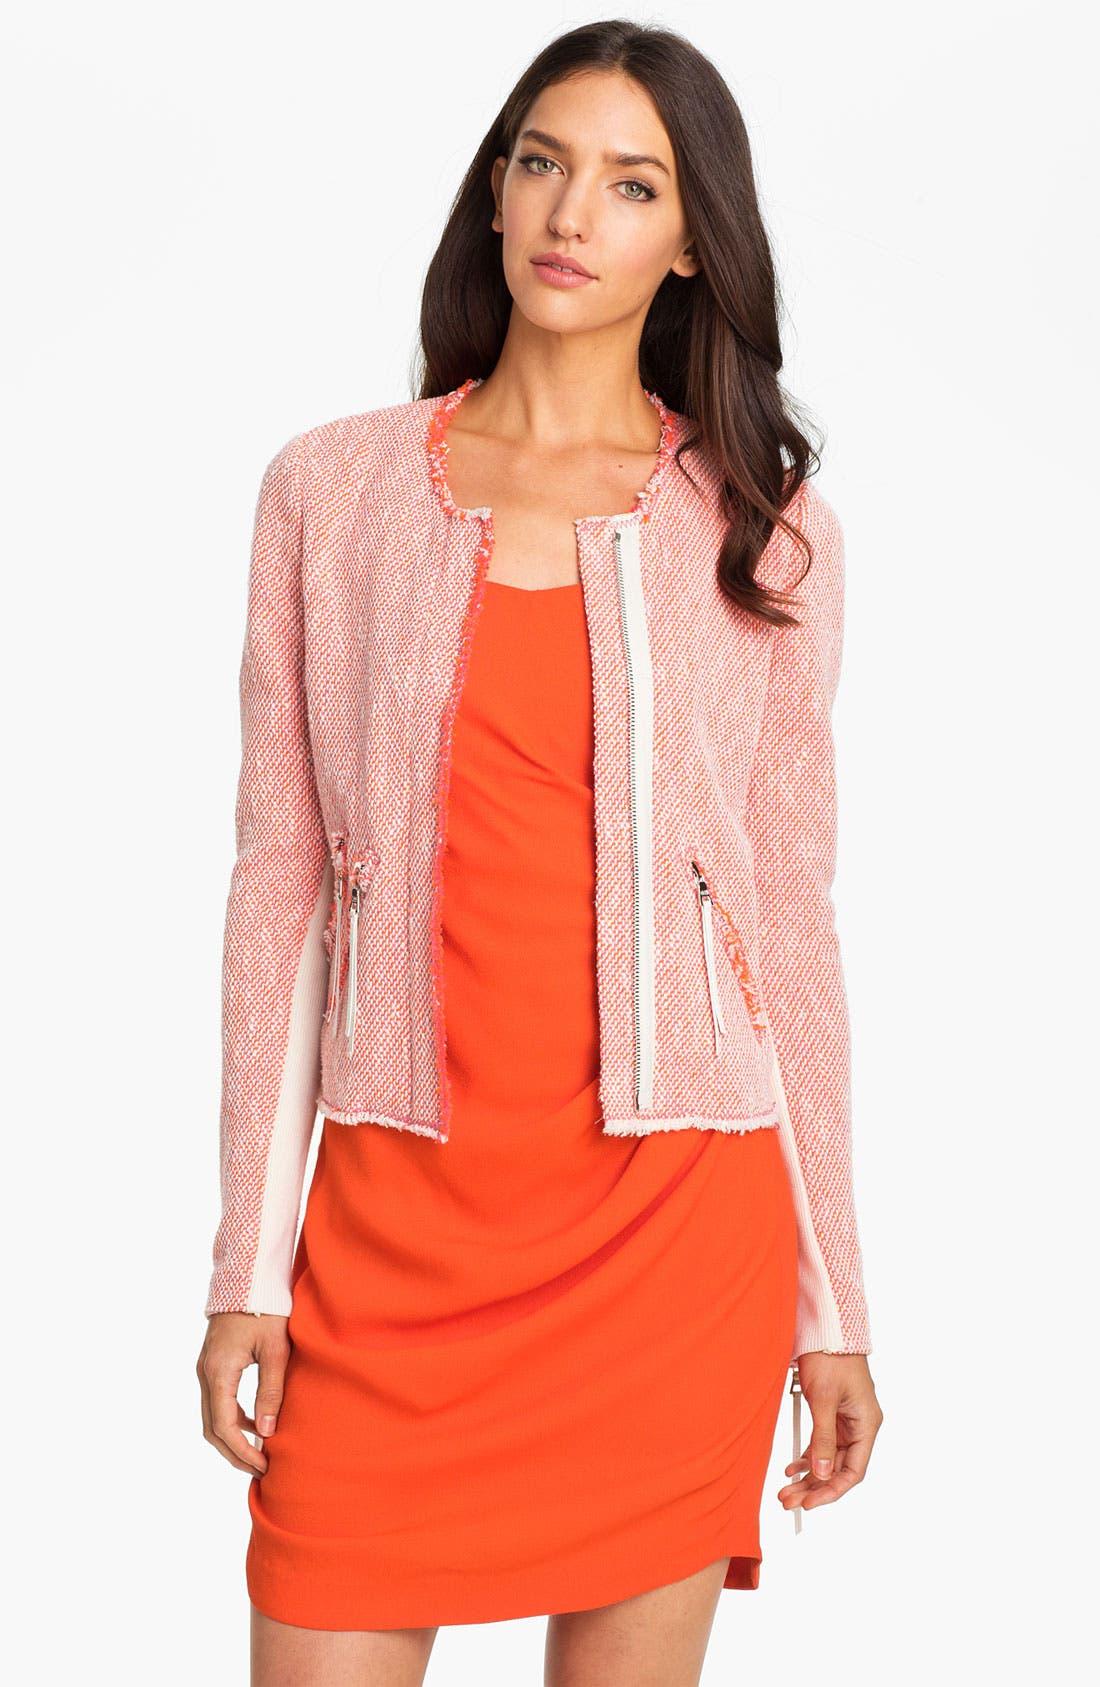 Alternate Image 1 Selected - Rebecca Taylor Neon Tweed Jacket